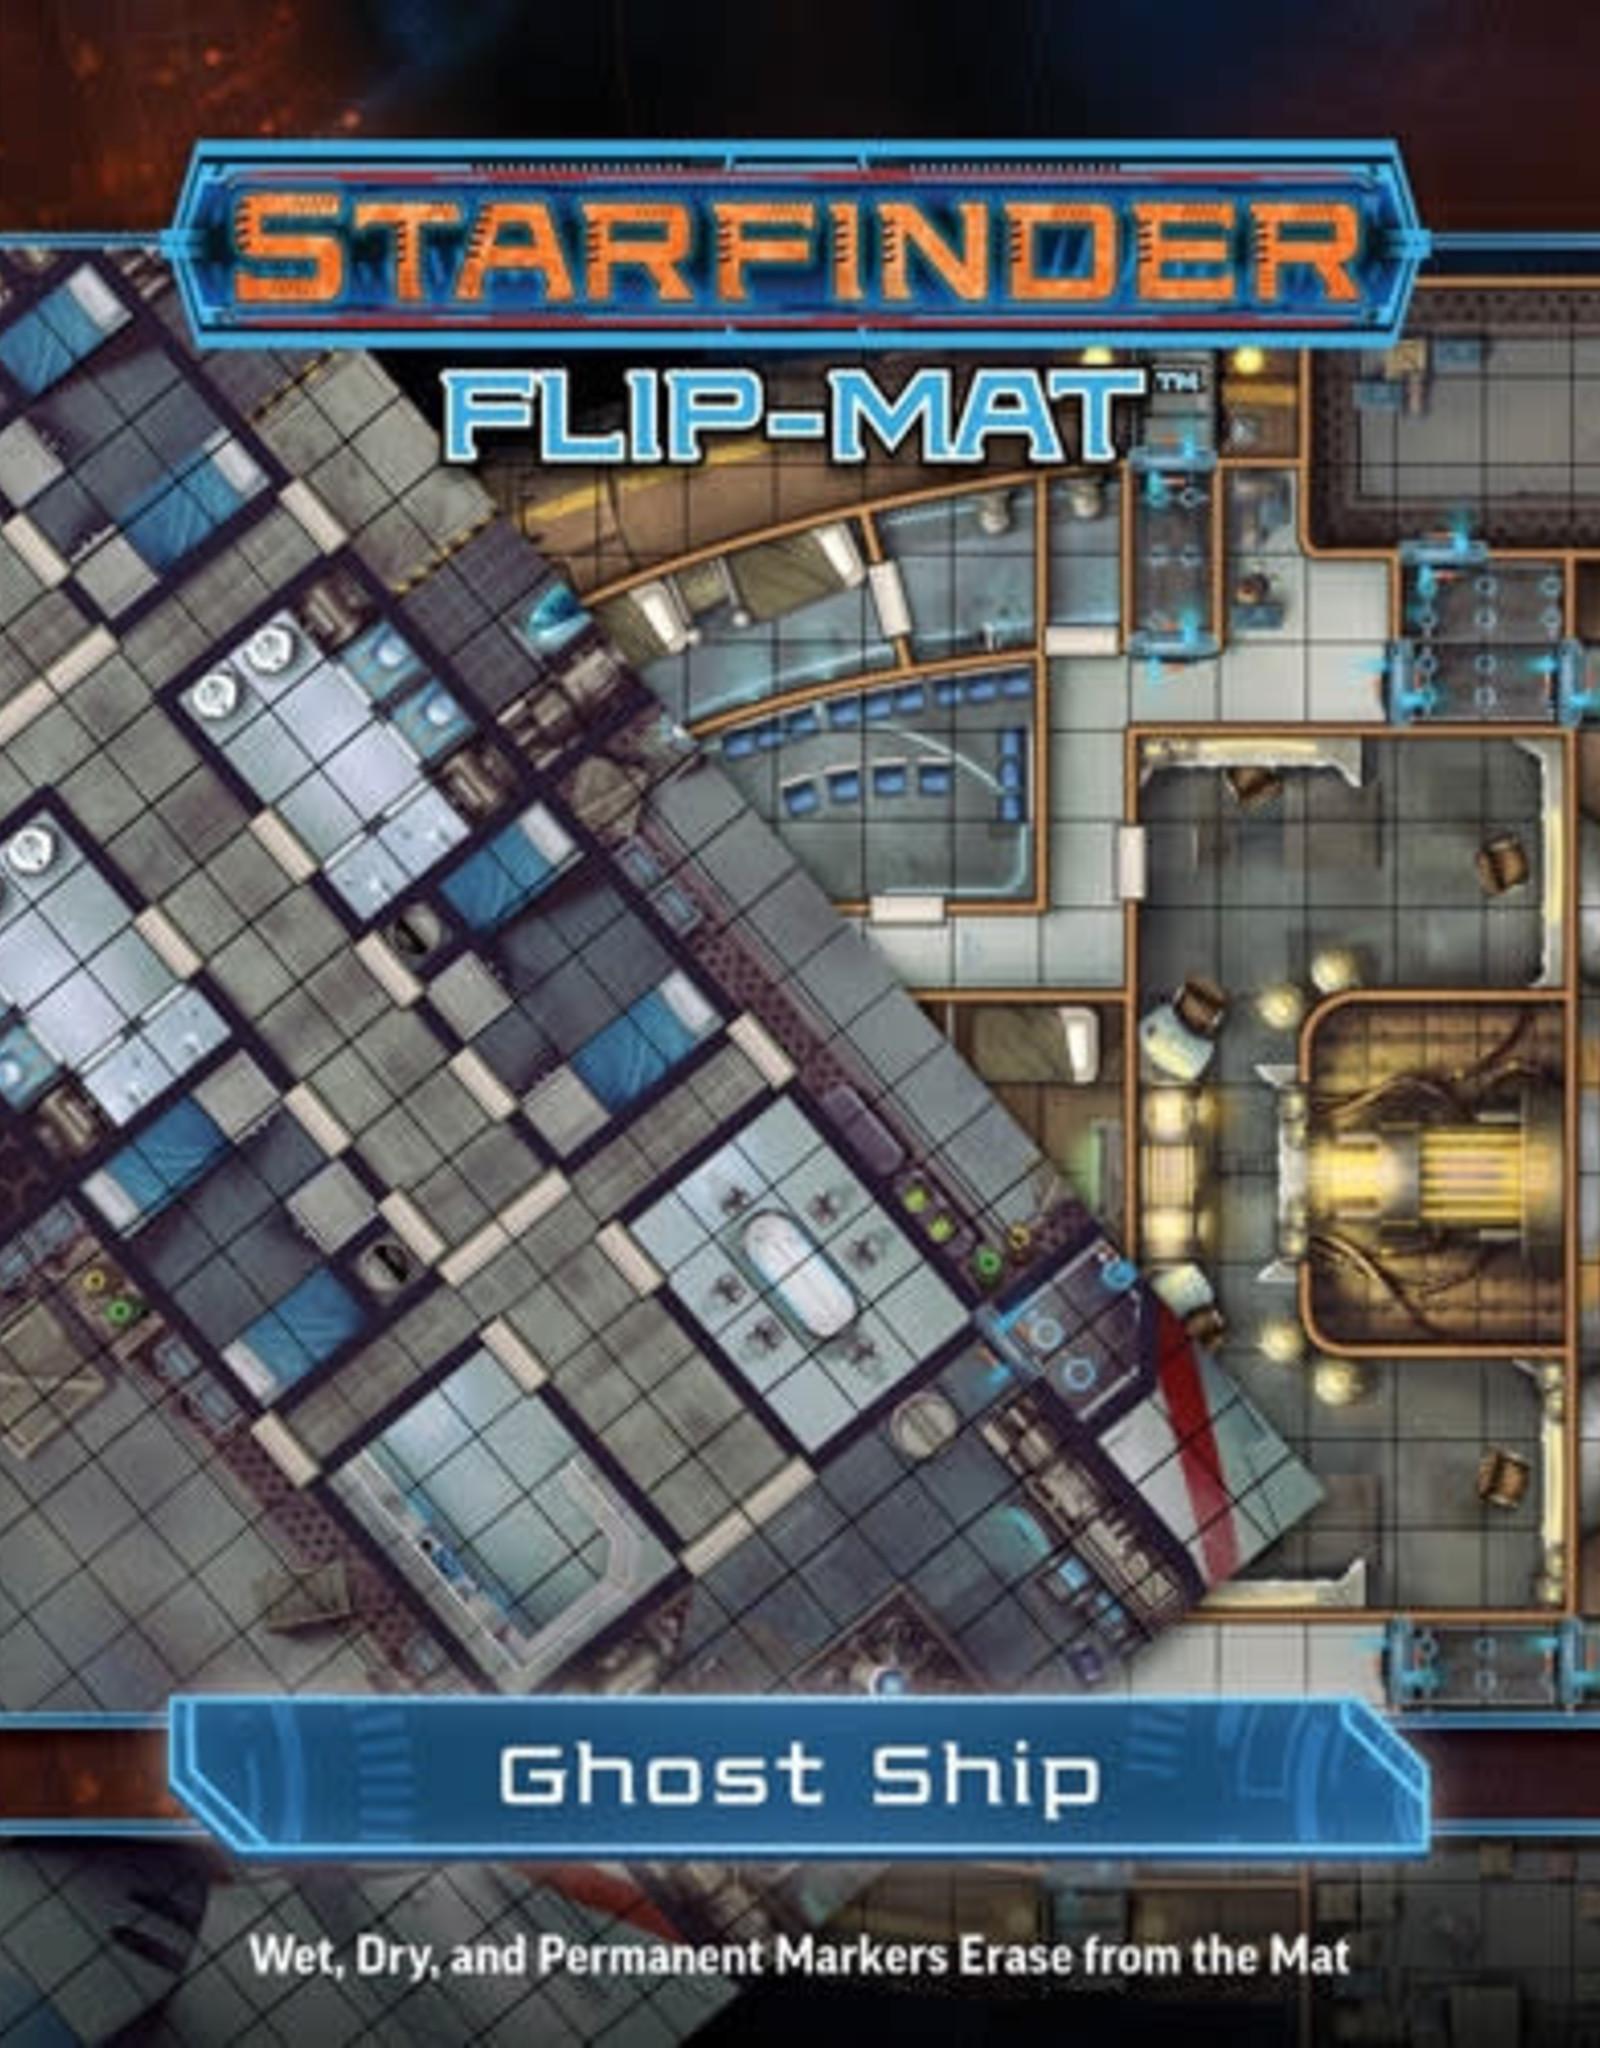 Starfinder RPG: Flip-Mat - Starship - Ghost Ship